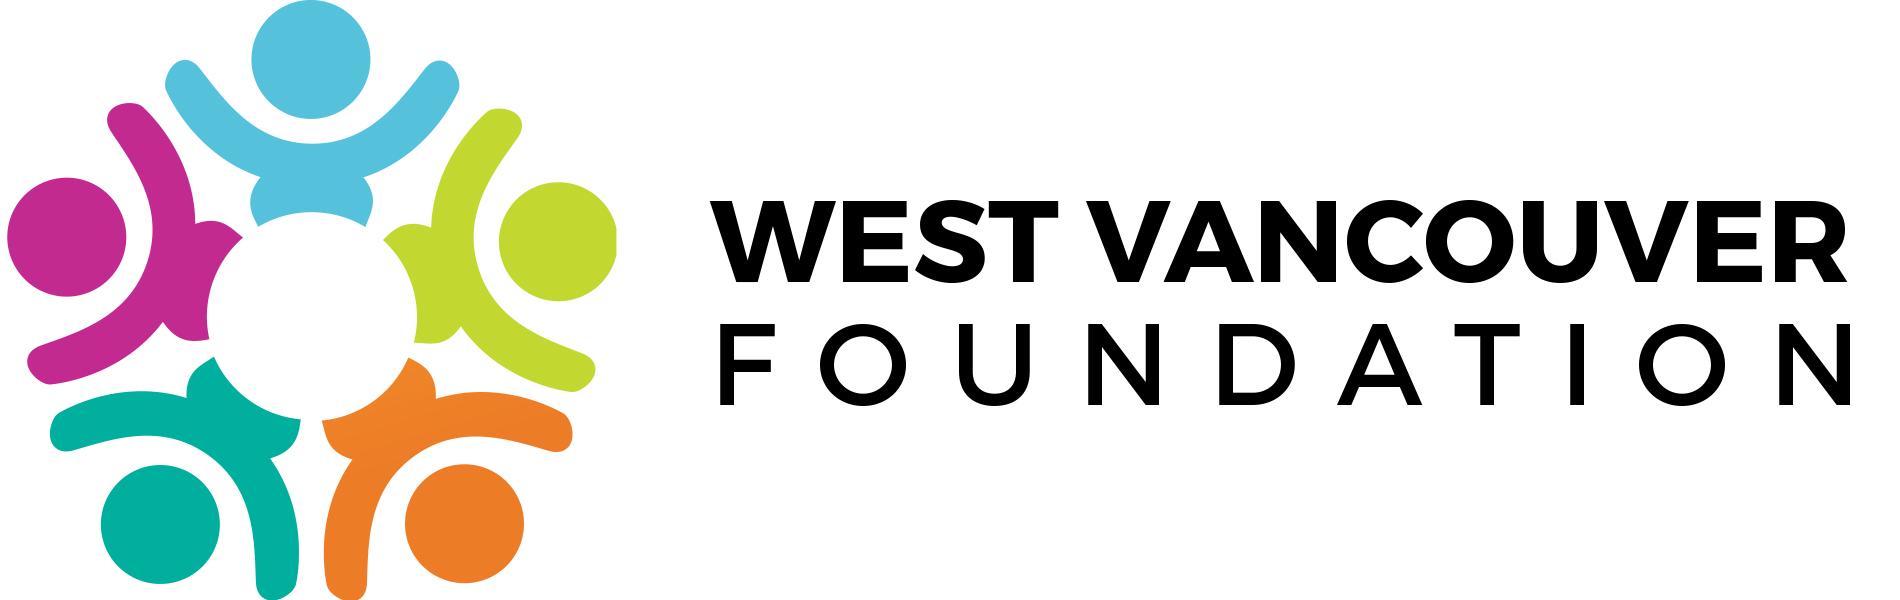 West_Vancouver_Foundation_Logo.jpg